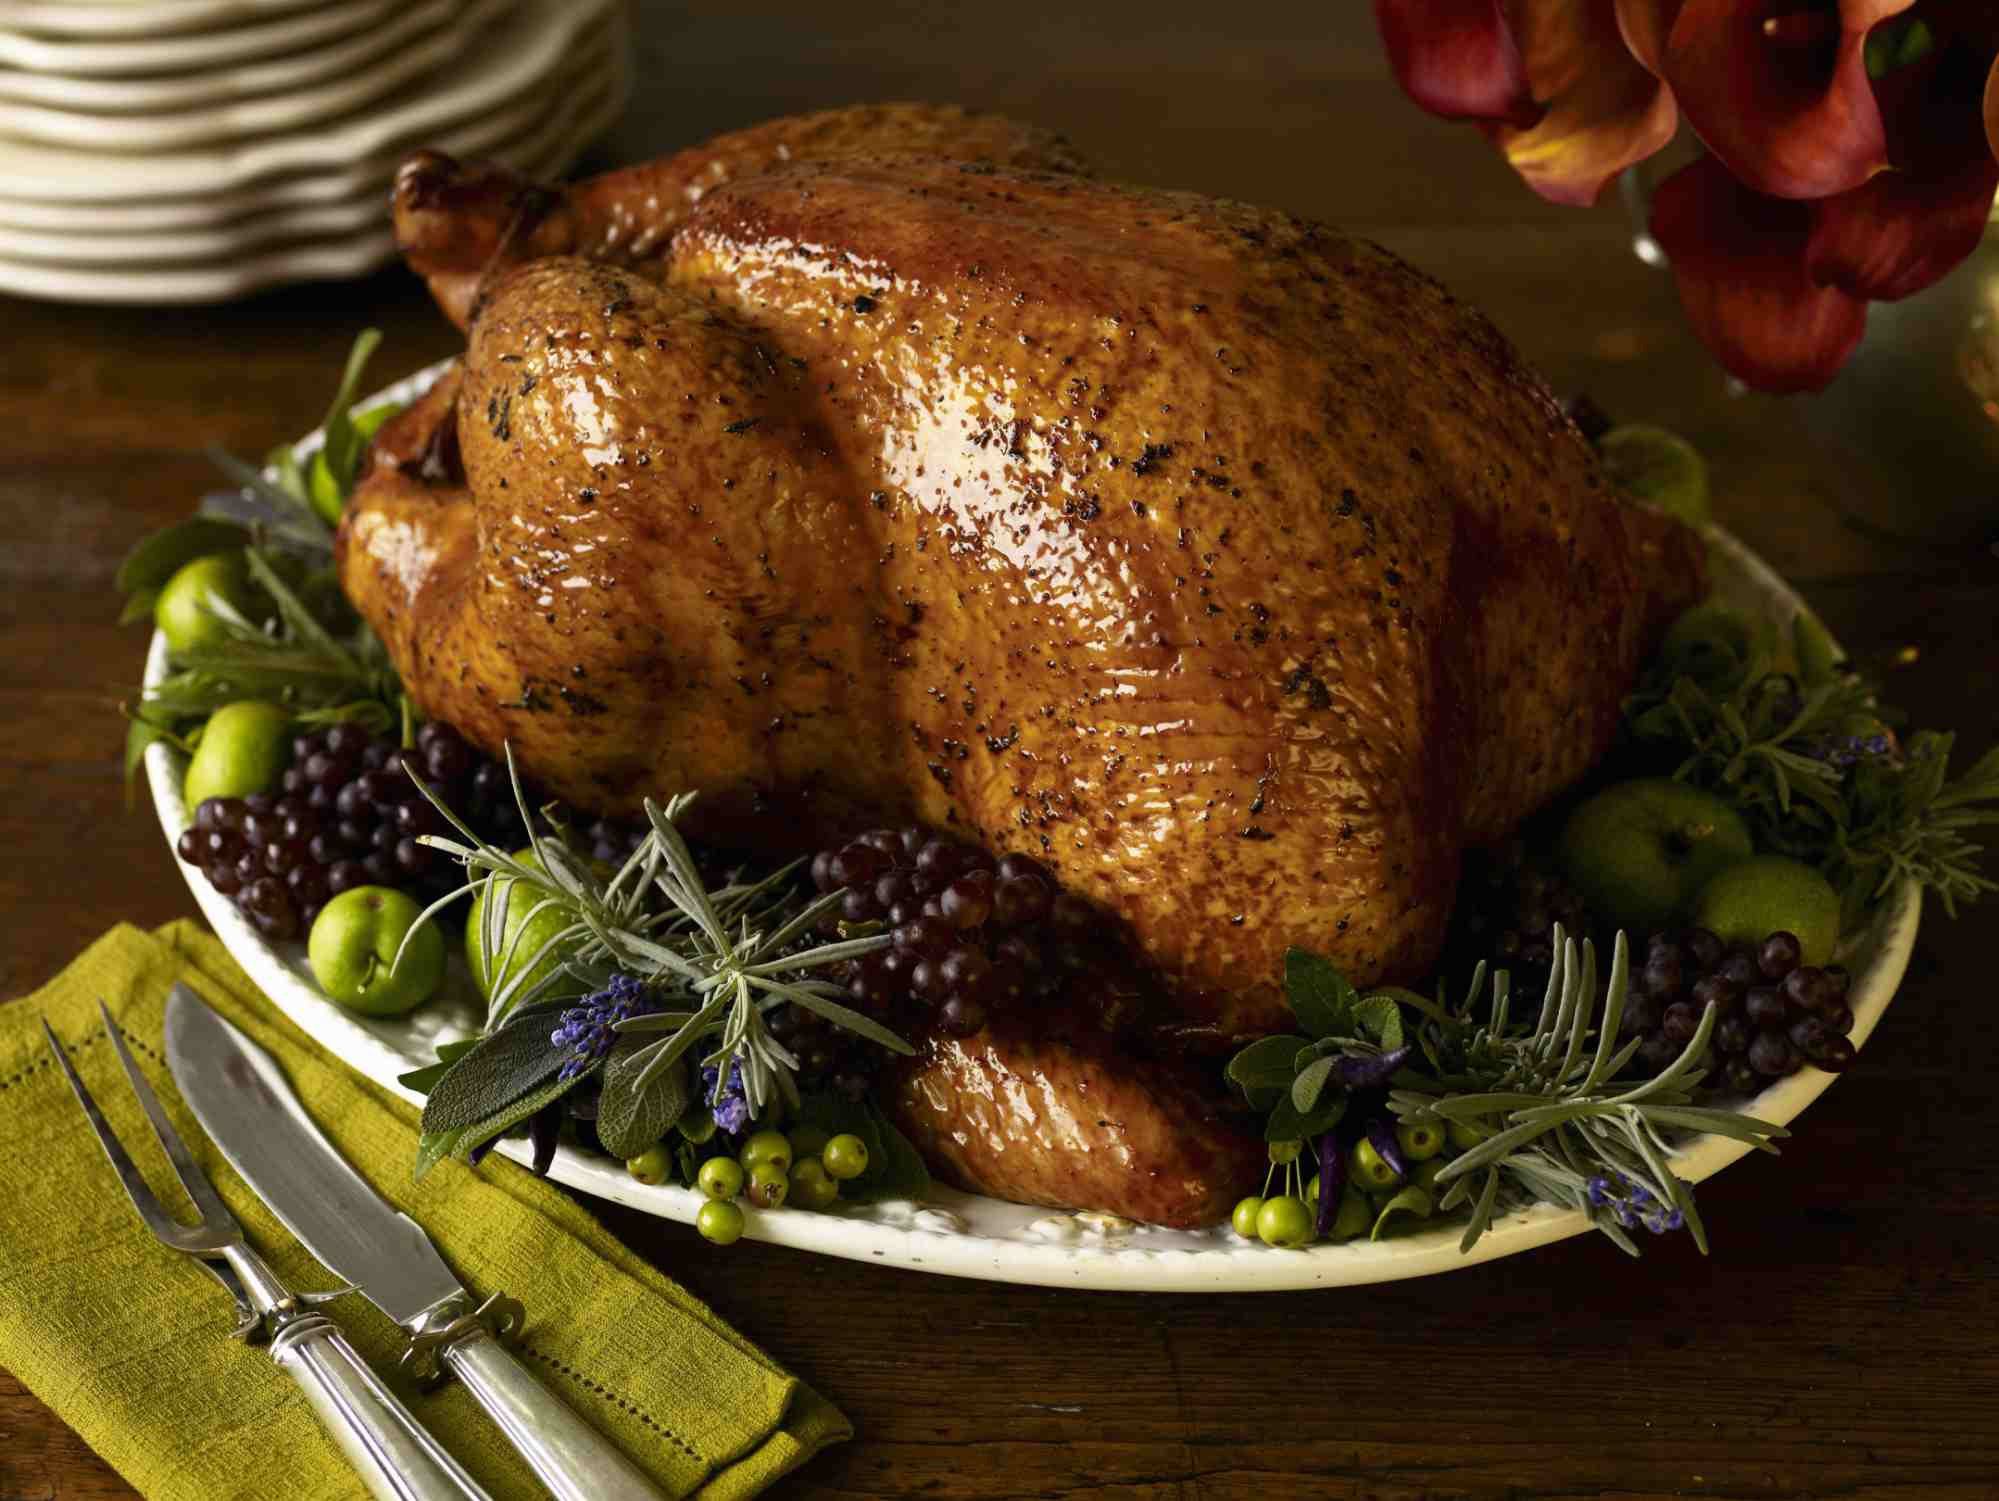 Turkey on a platter.